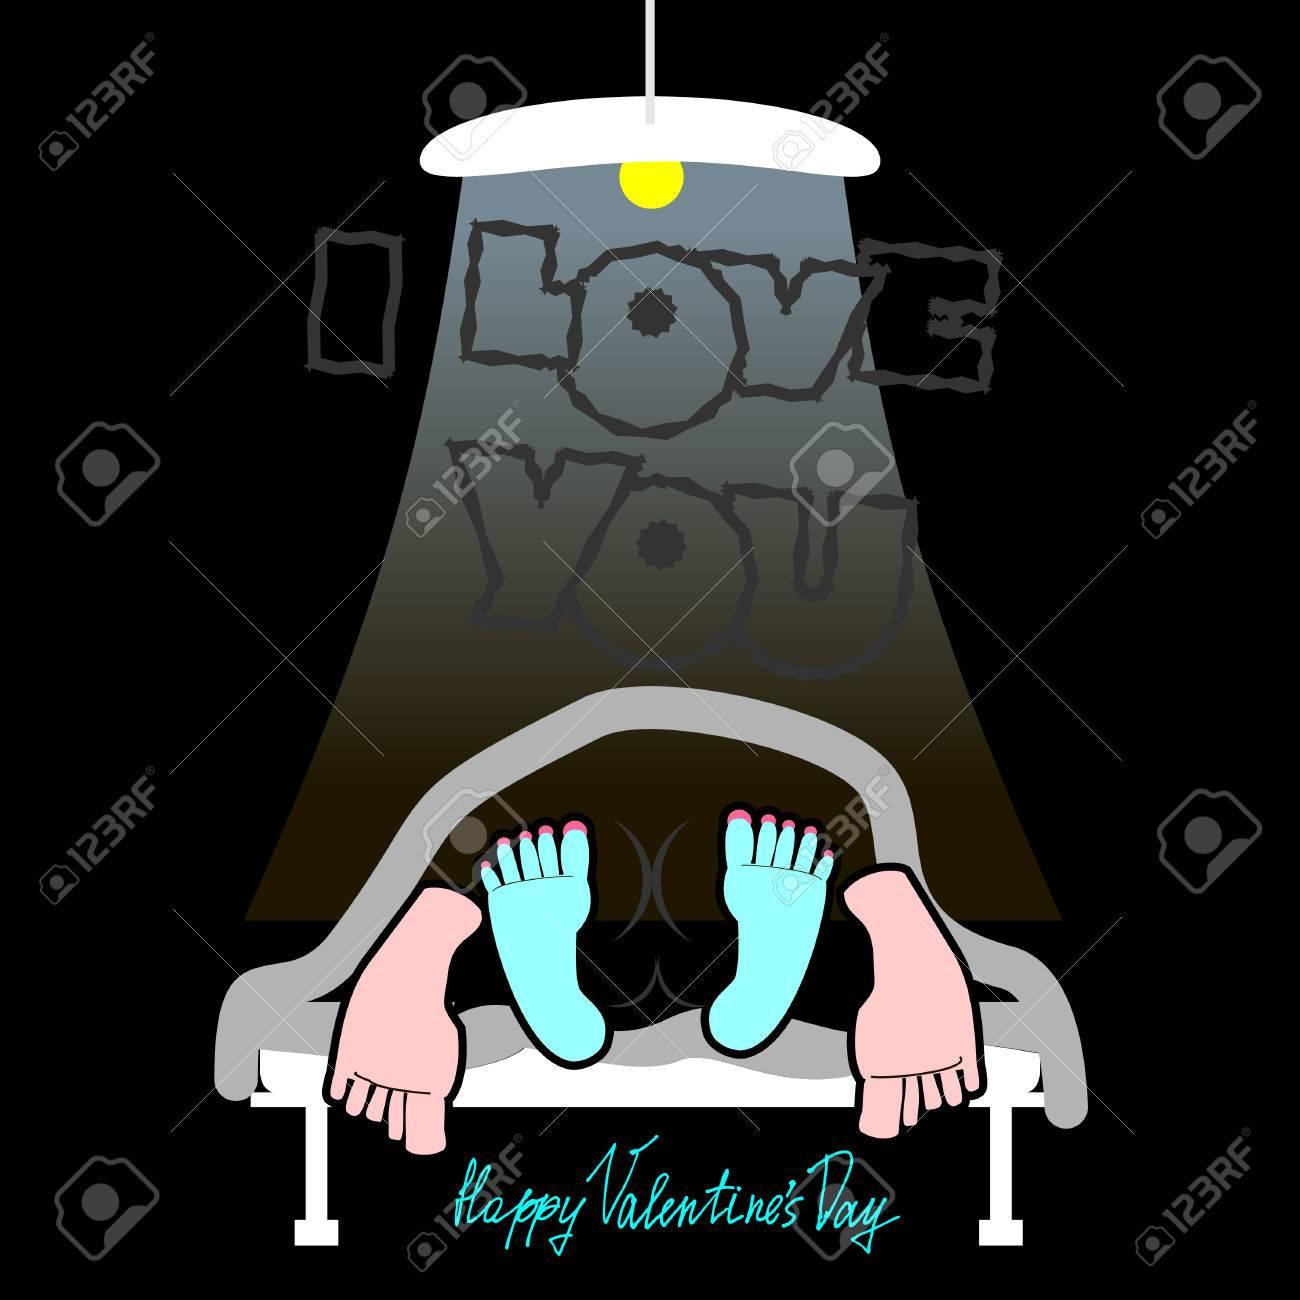 Valentine Joyful Unusual Valentines Day Card A Funny Dark – Unusual Valentines Day Cards